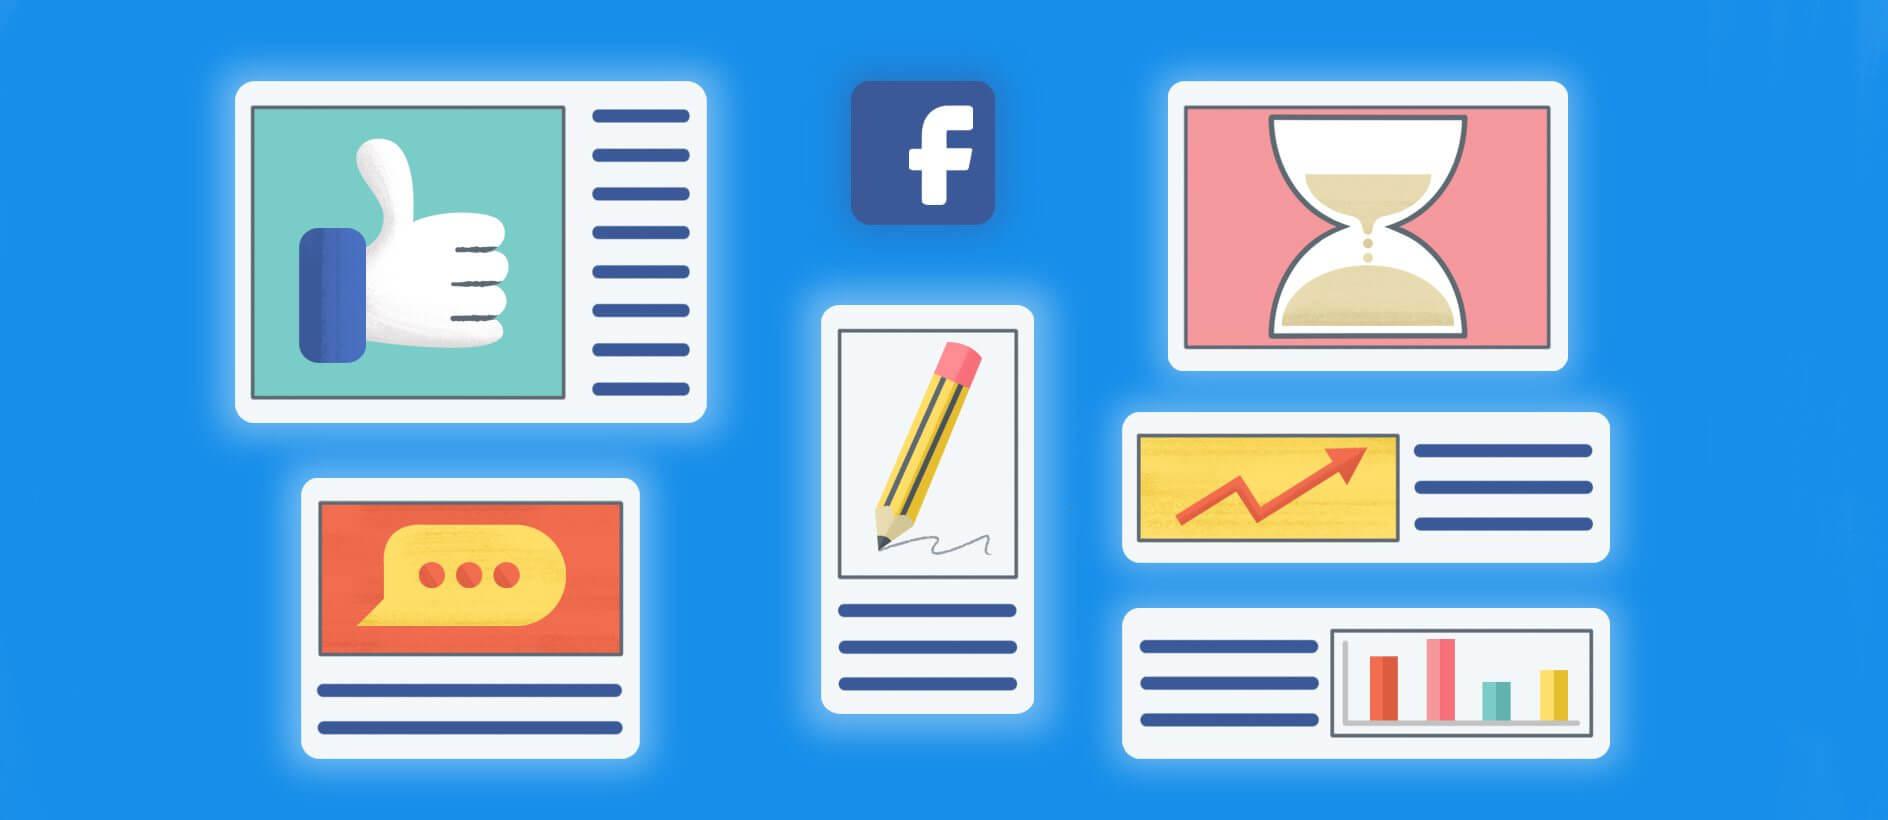 Activity on Facebook